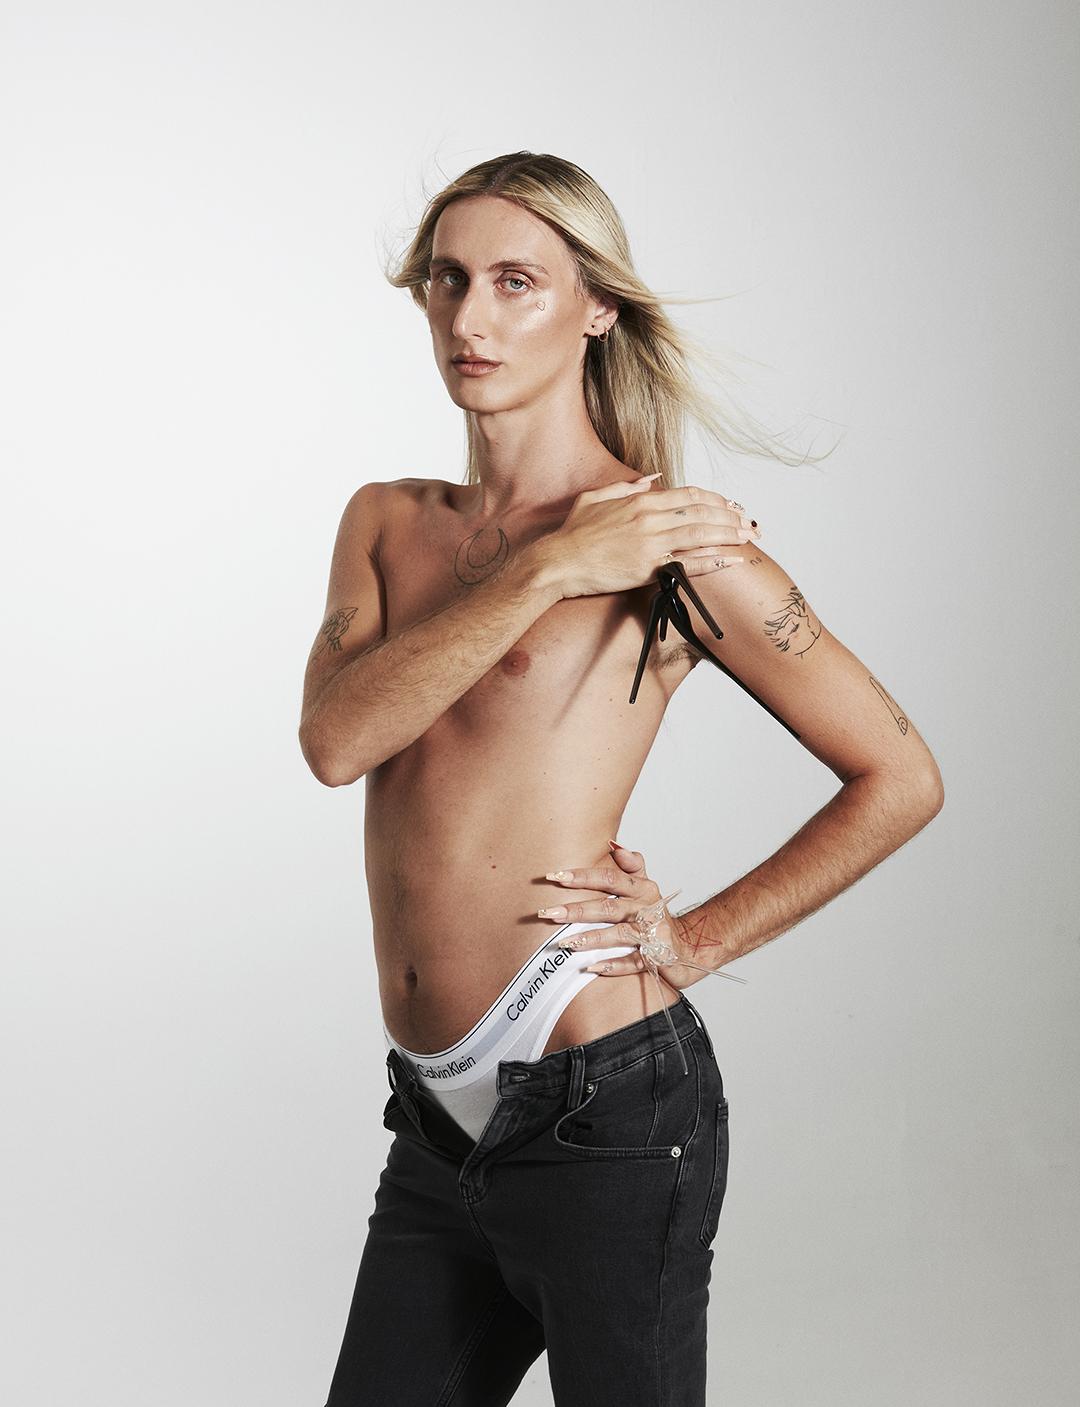 Alex de la croix - Neo 2 - Calvin Klein - Editorial - rafa gallar - 8 artist management - 8am